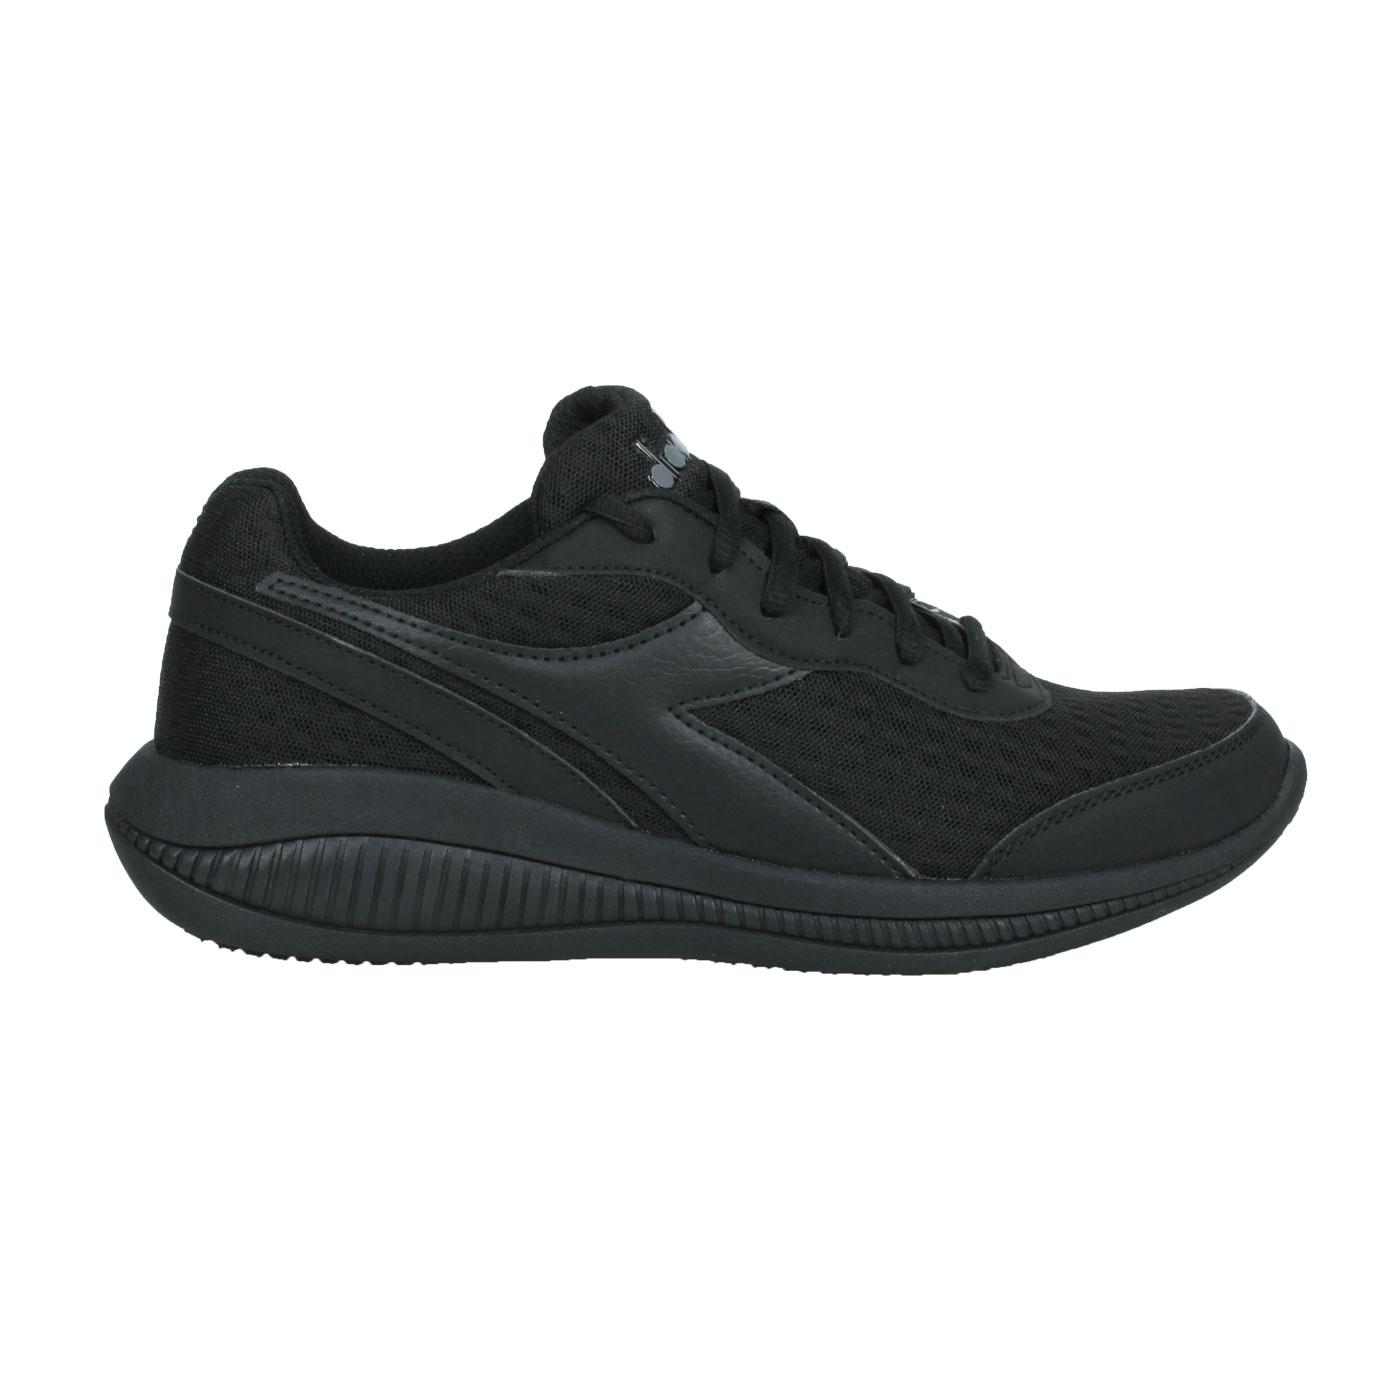 DIADORA 女款進口慢跑鞋 DA176894-C0200 - 黑